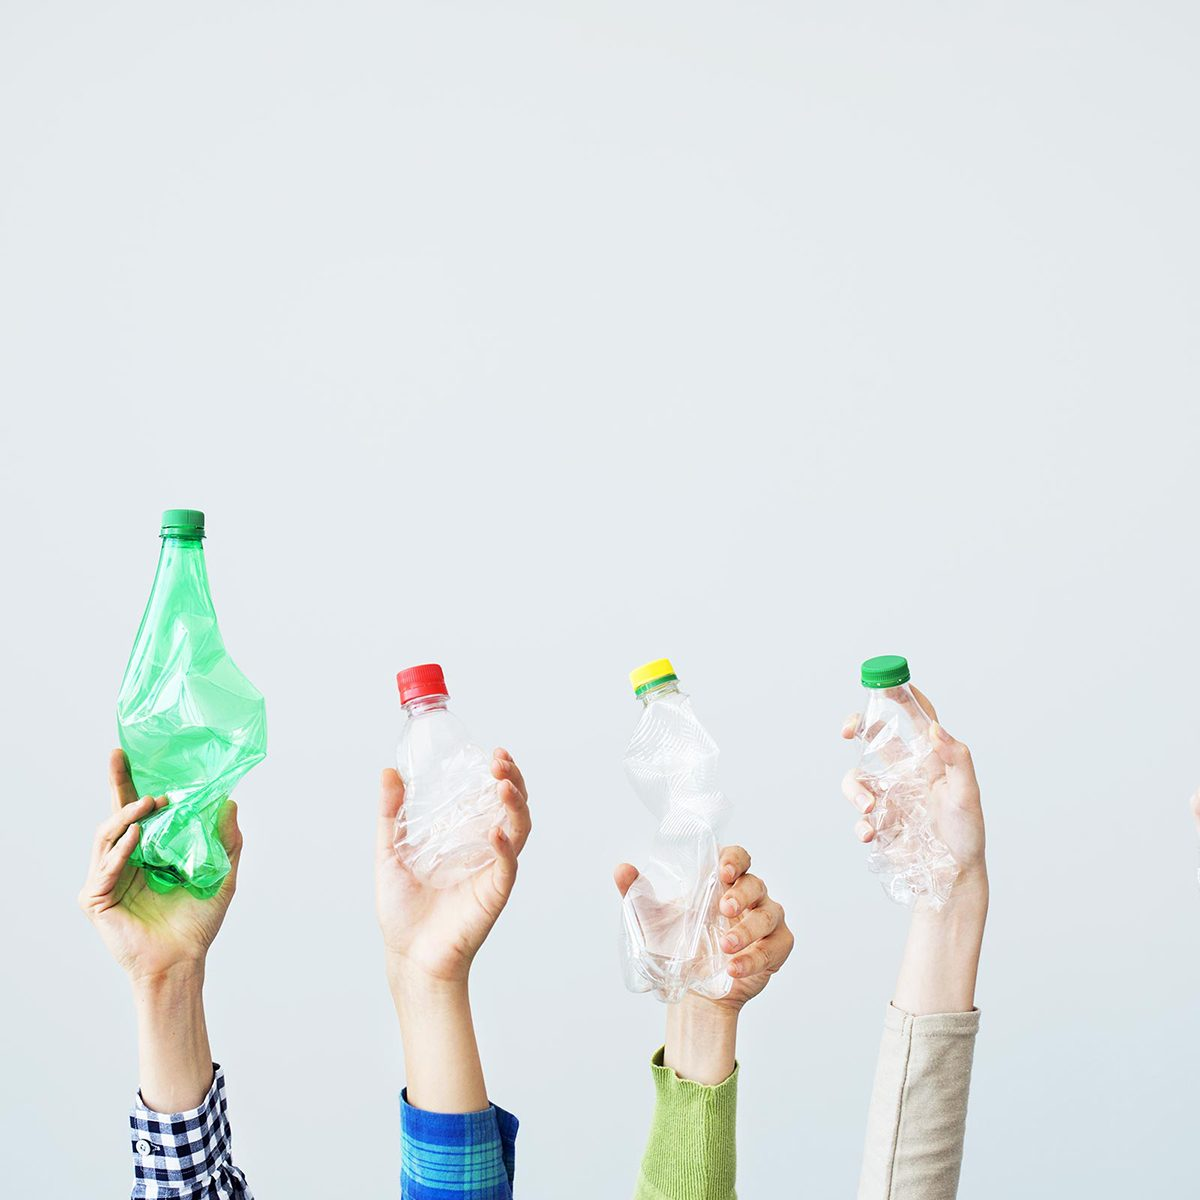 Hands holding up plastic bottles